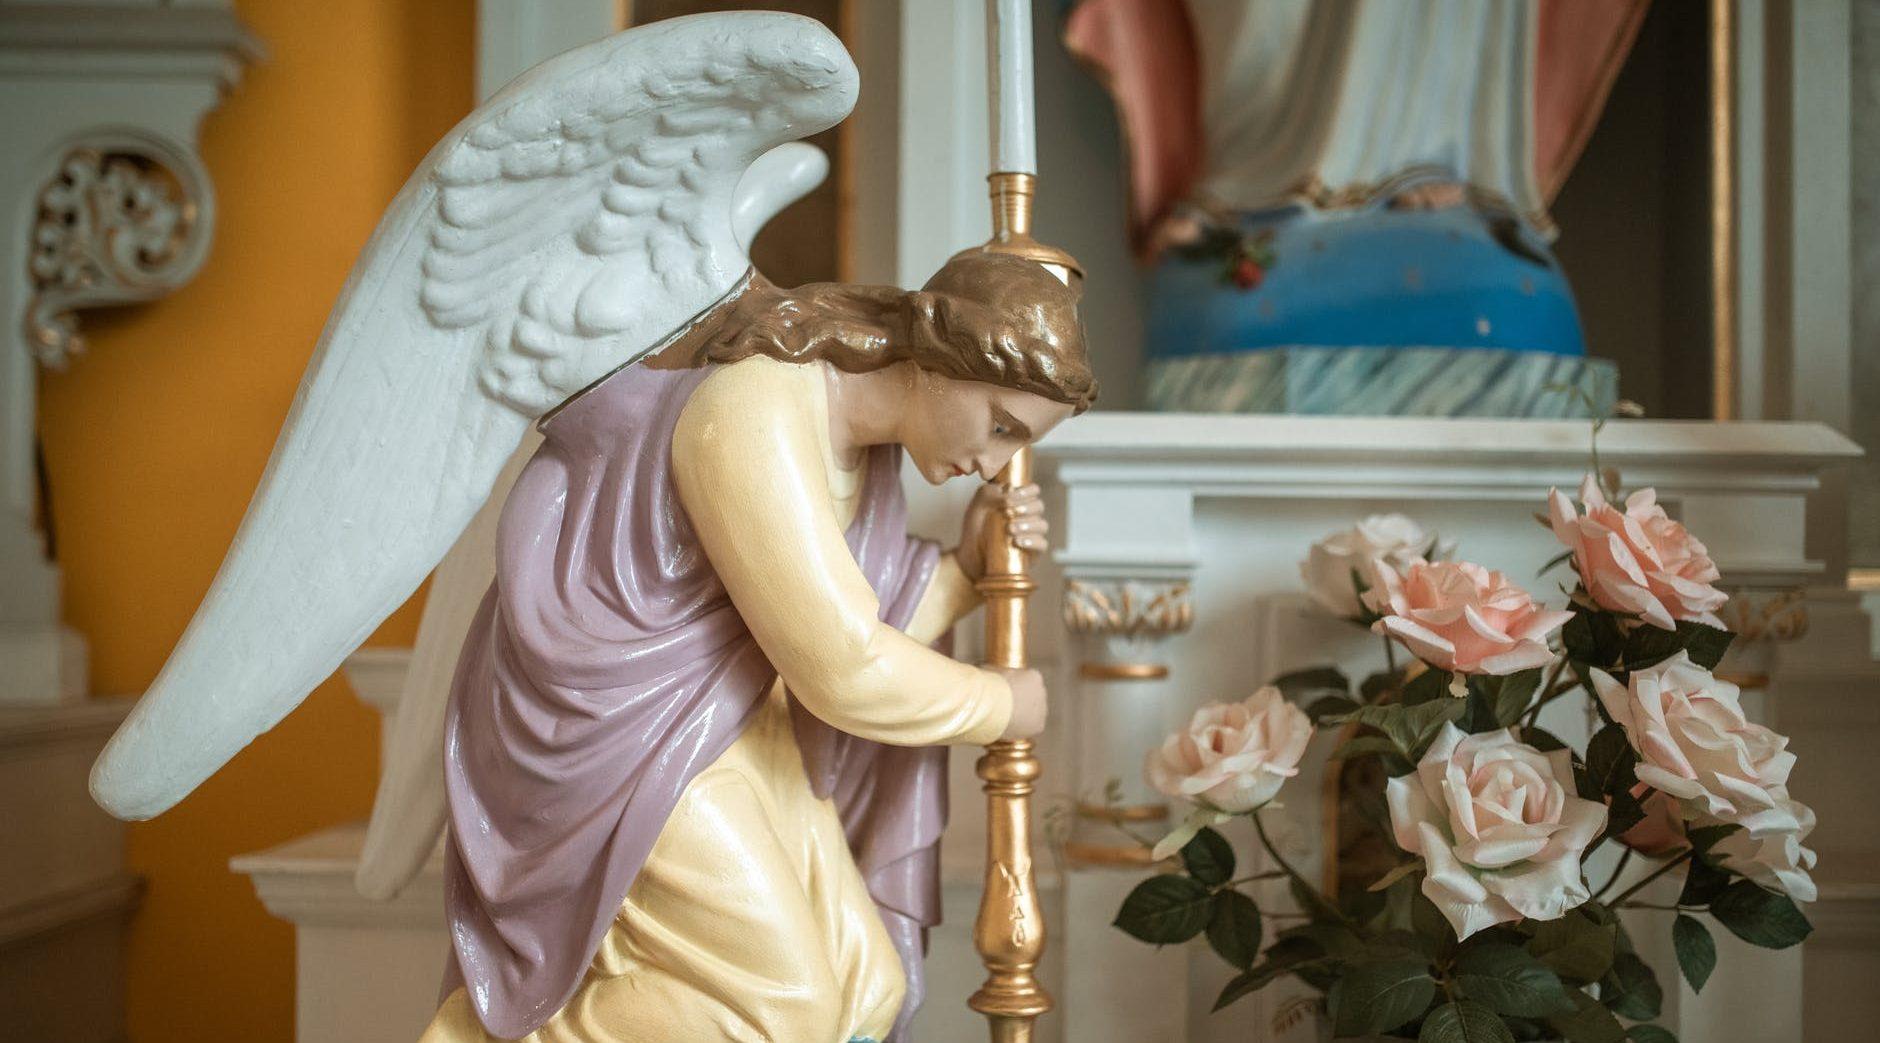 close up shot of an angel figurine